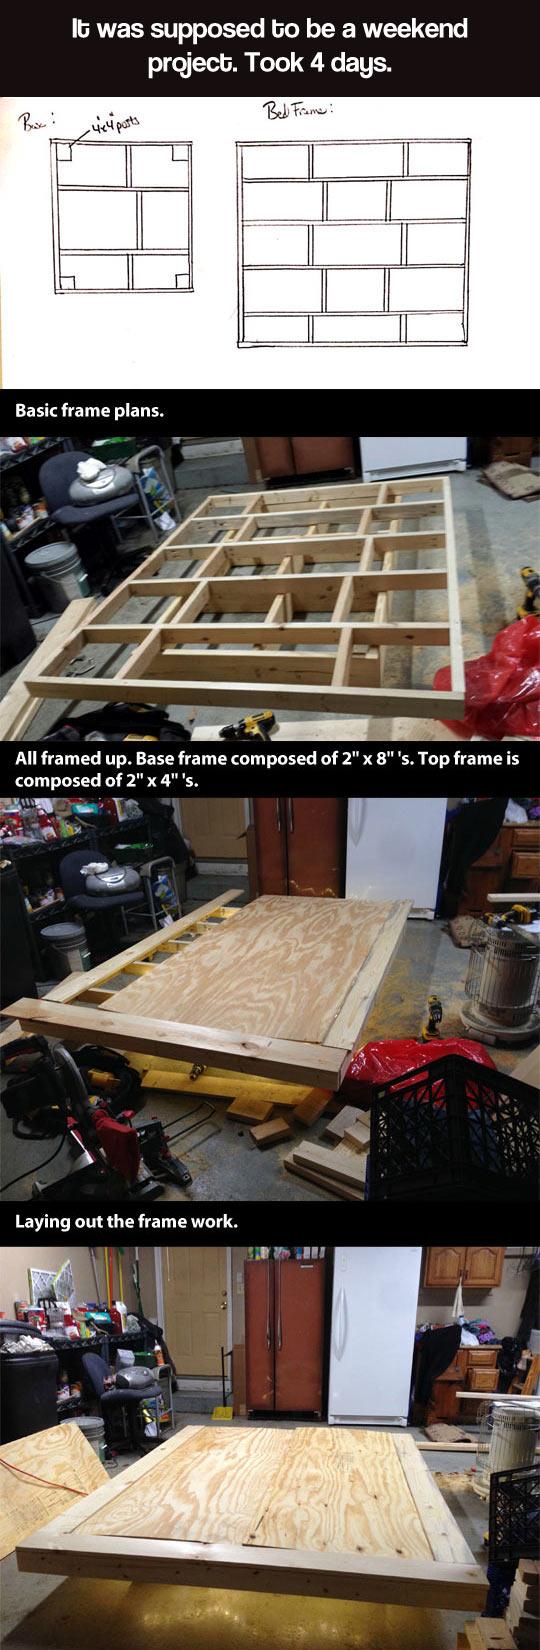 Building a levitating bed...